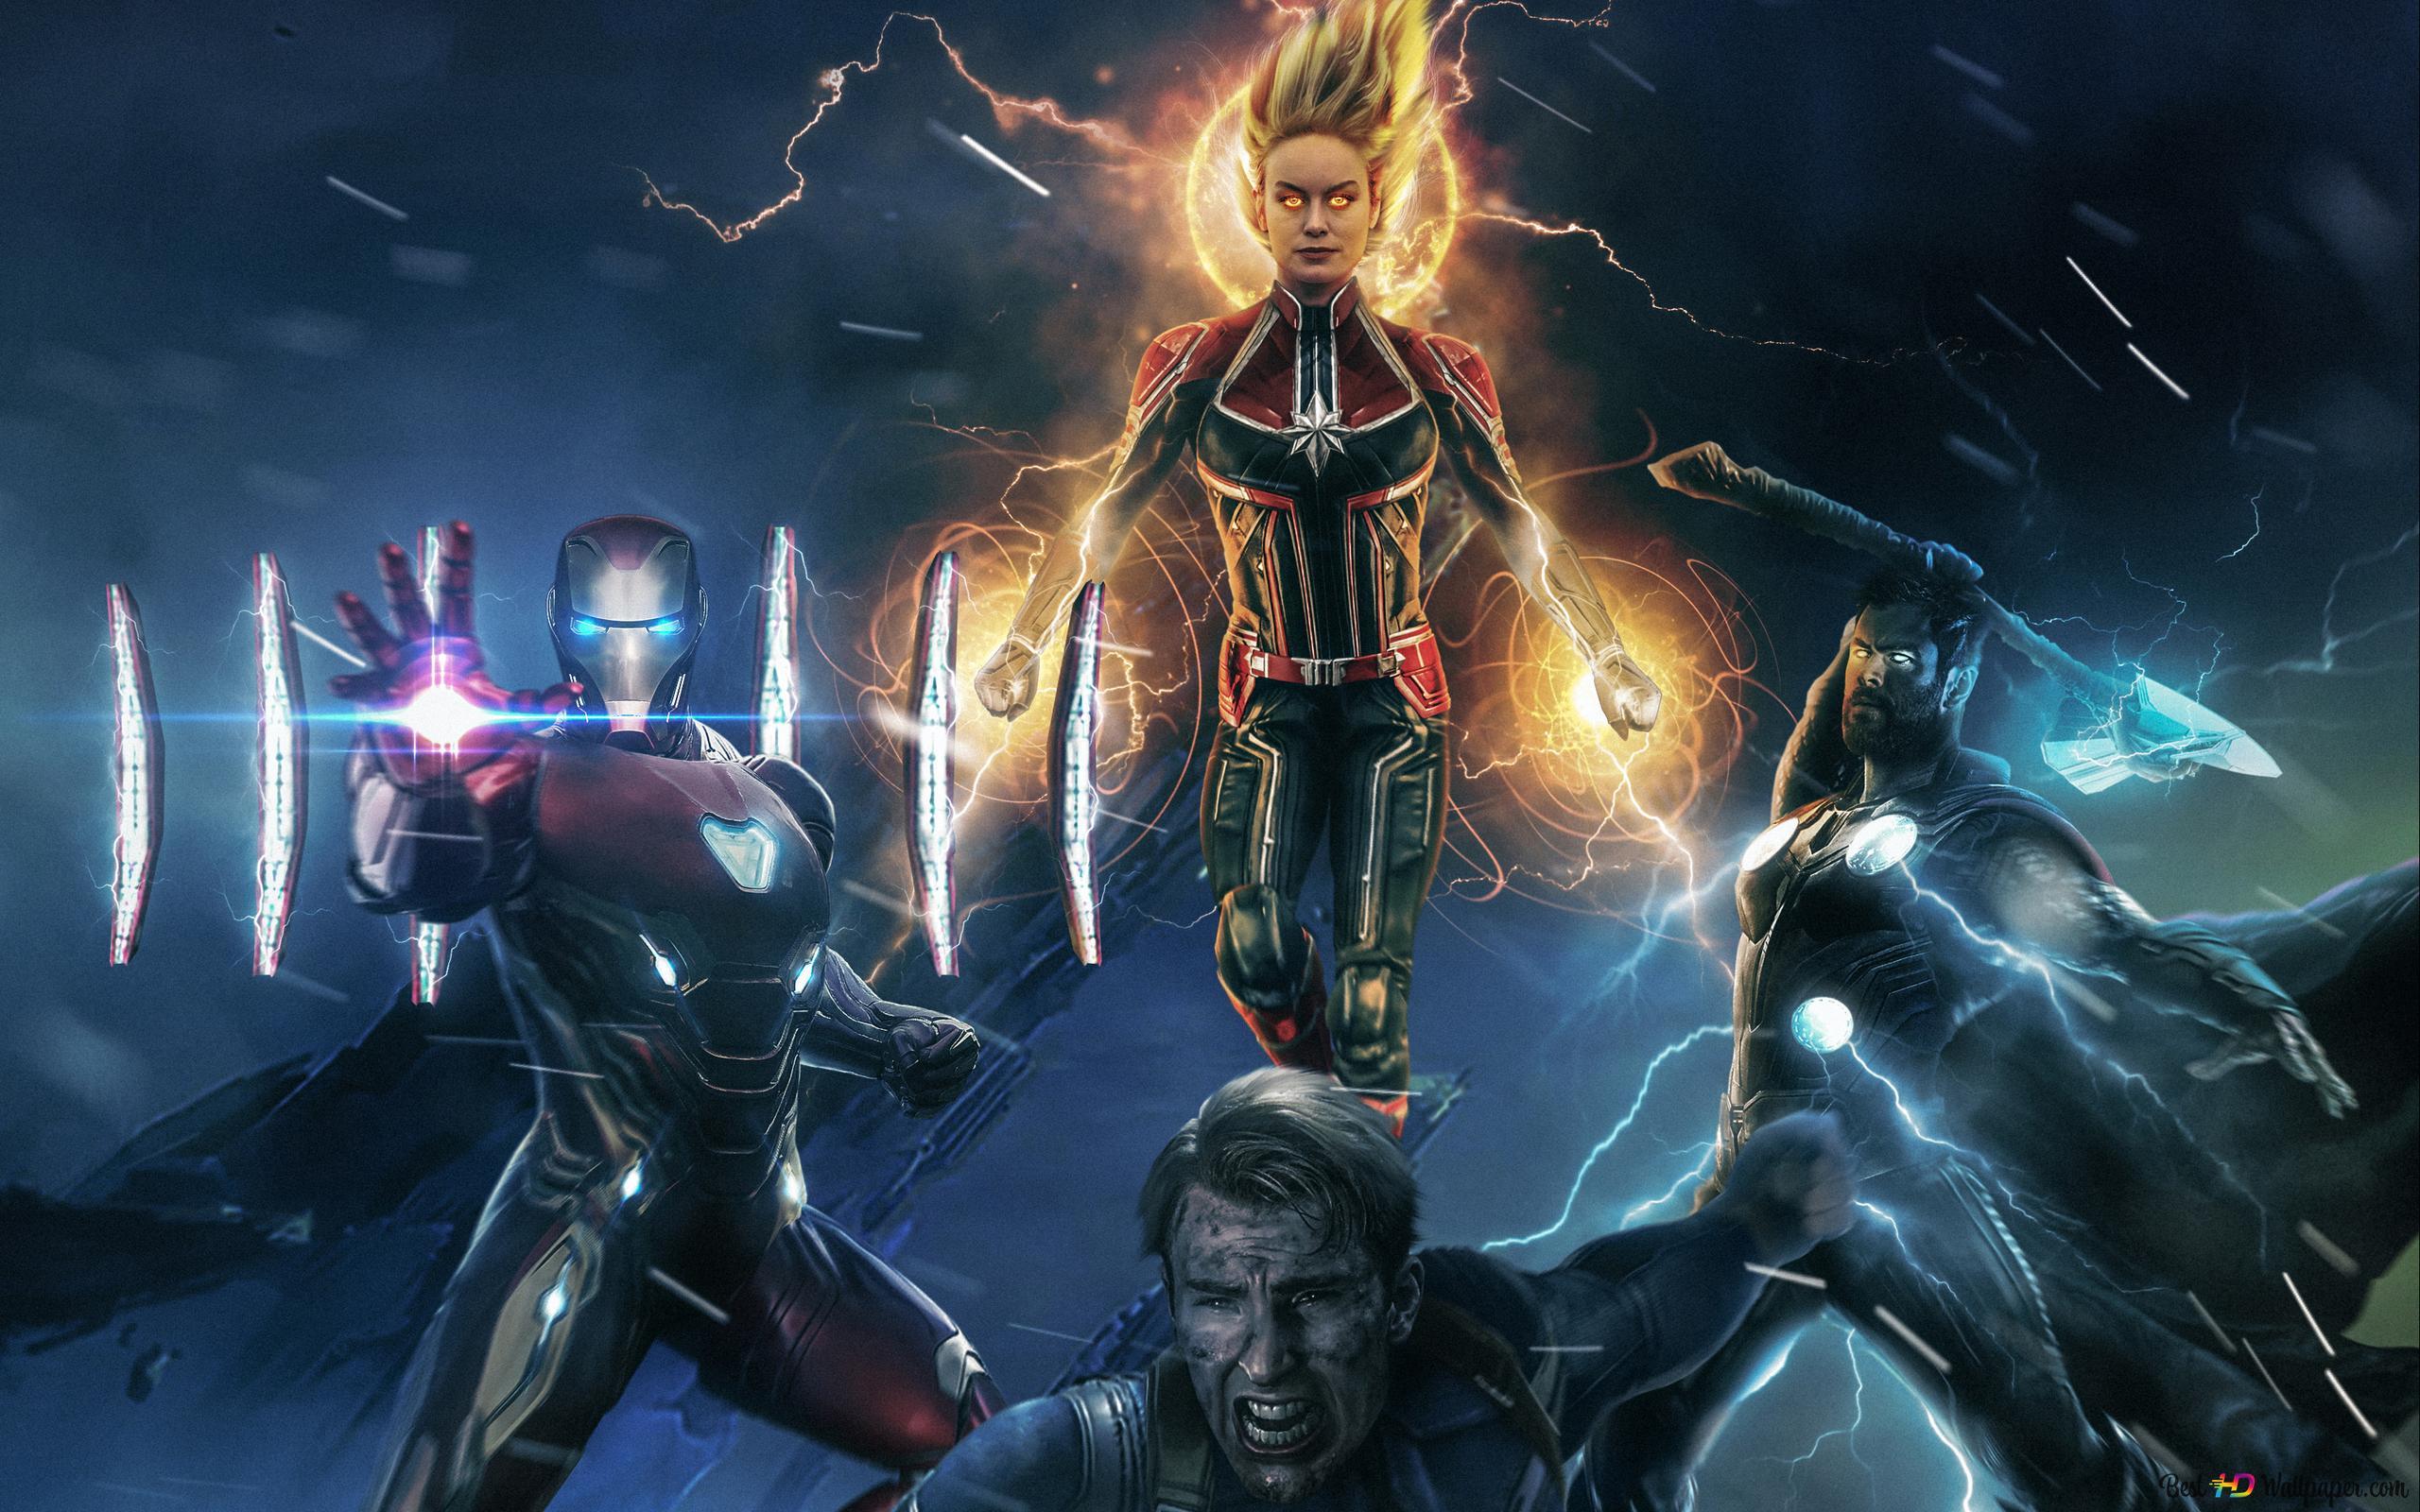 Avengers Endgame Powerful Superheroes Hd Wallpaper Download